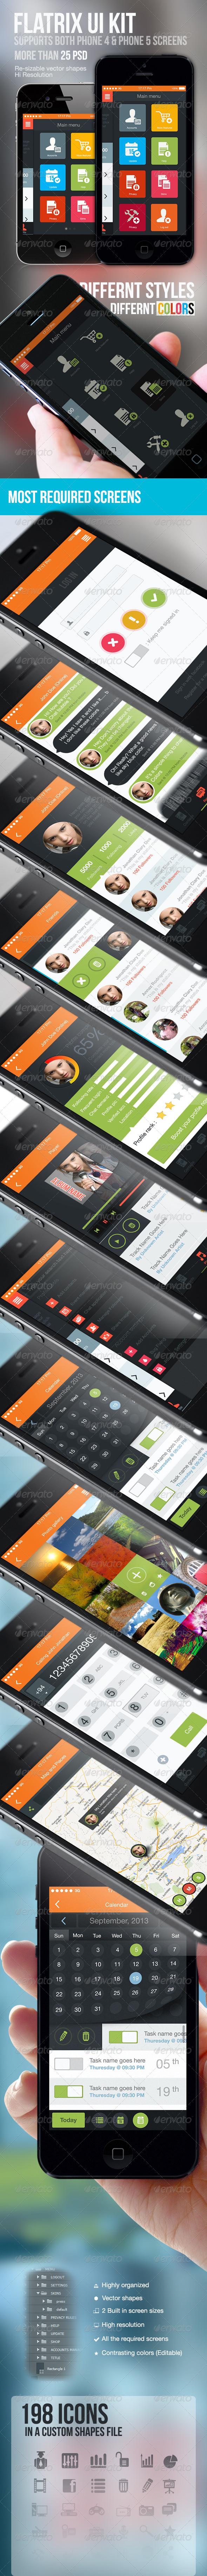 GraphicRiver Flatrix Flat Ui Kit For Mobile 5615244